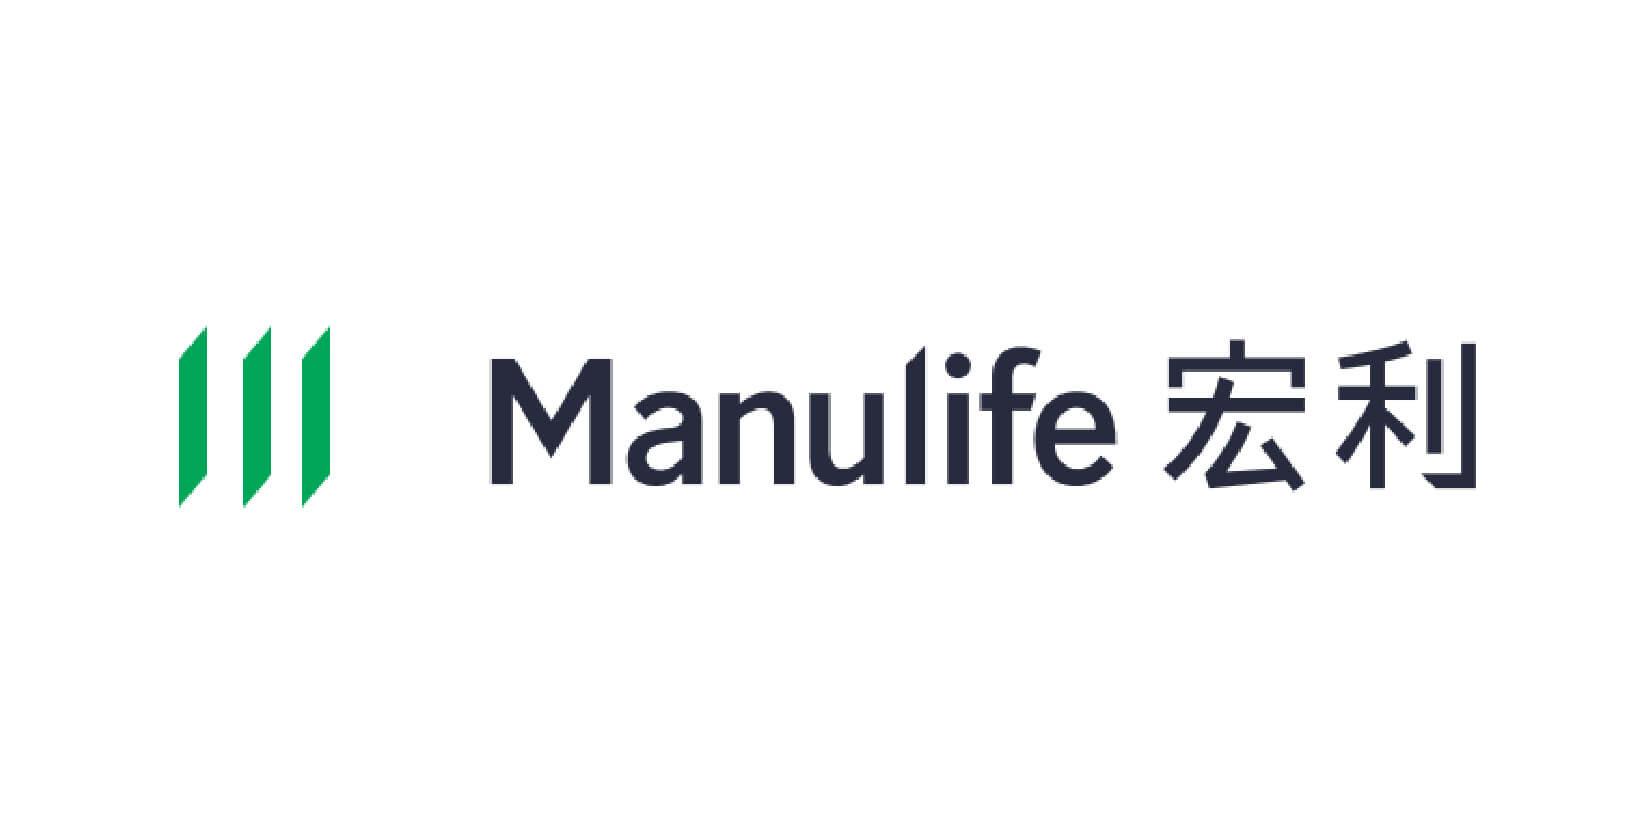 Mannulife 宏利 macau jobscall.me recruitment ad 澳門招聘-01.jpg